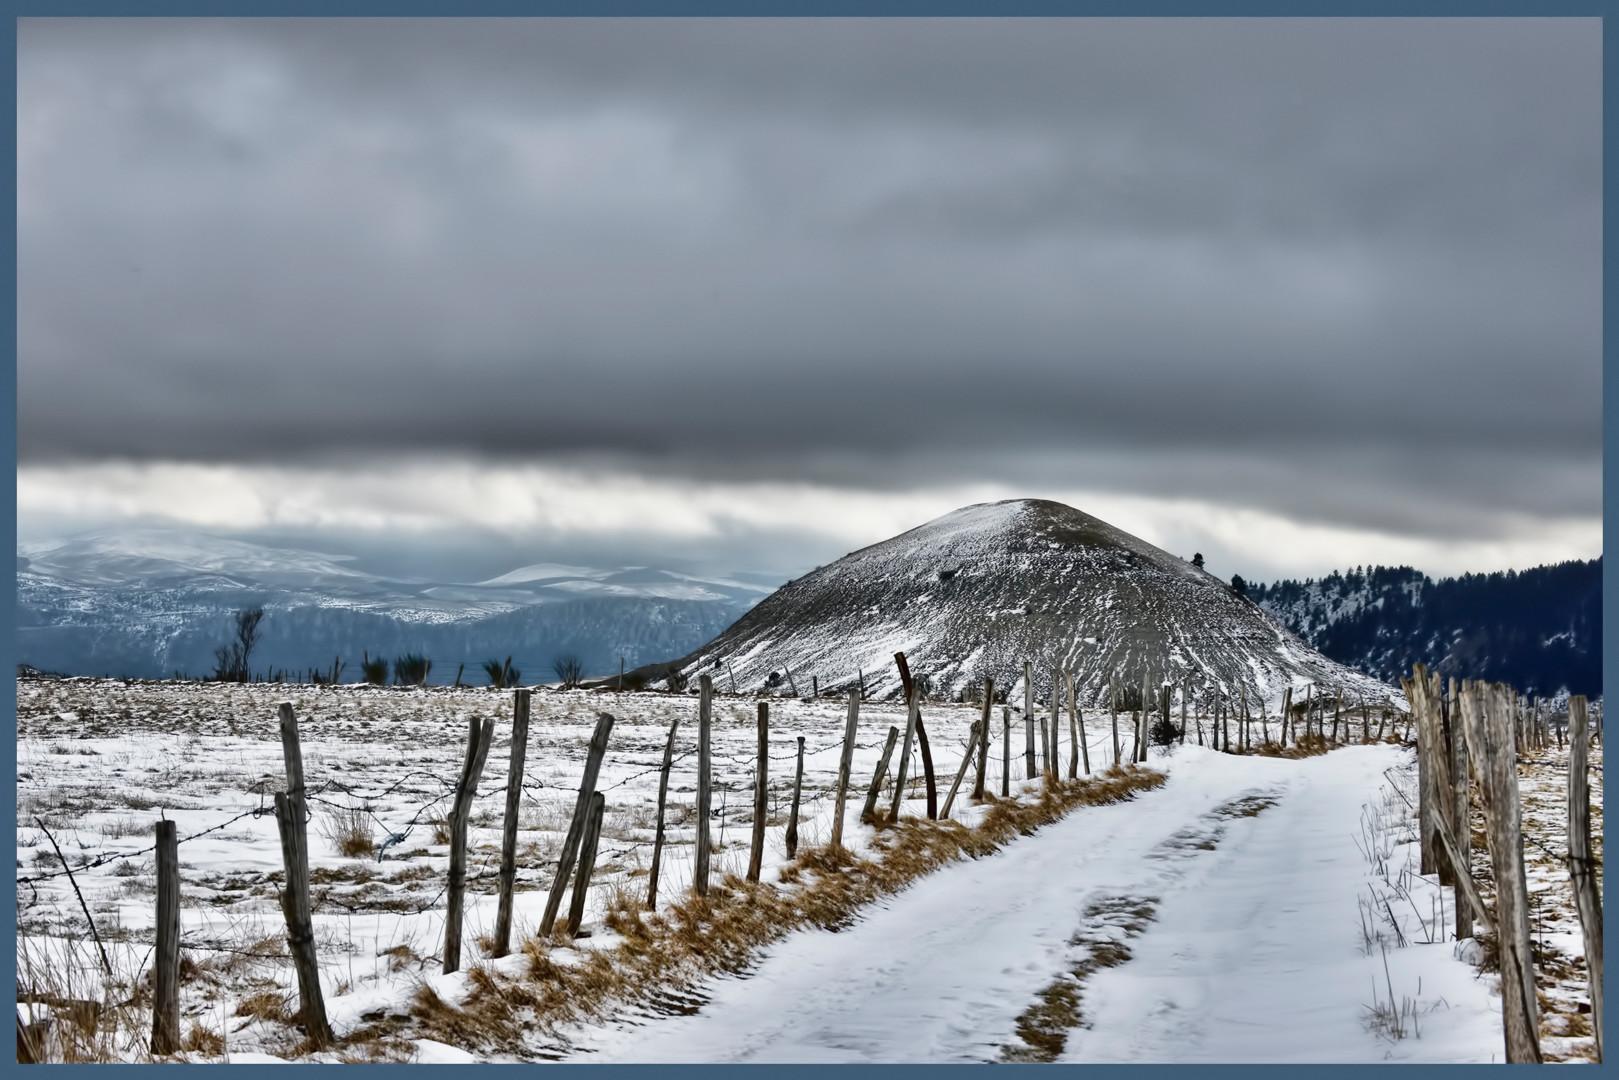 ALAIN BRASSEUR - Le bel hiver.....83